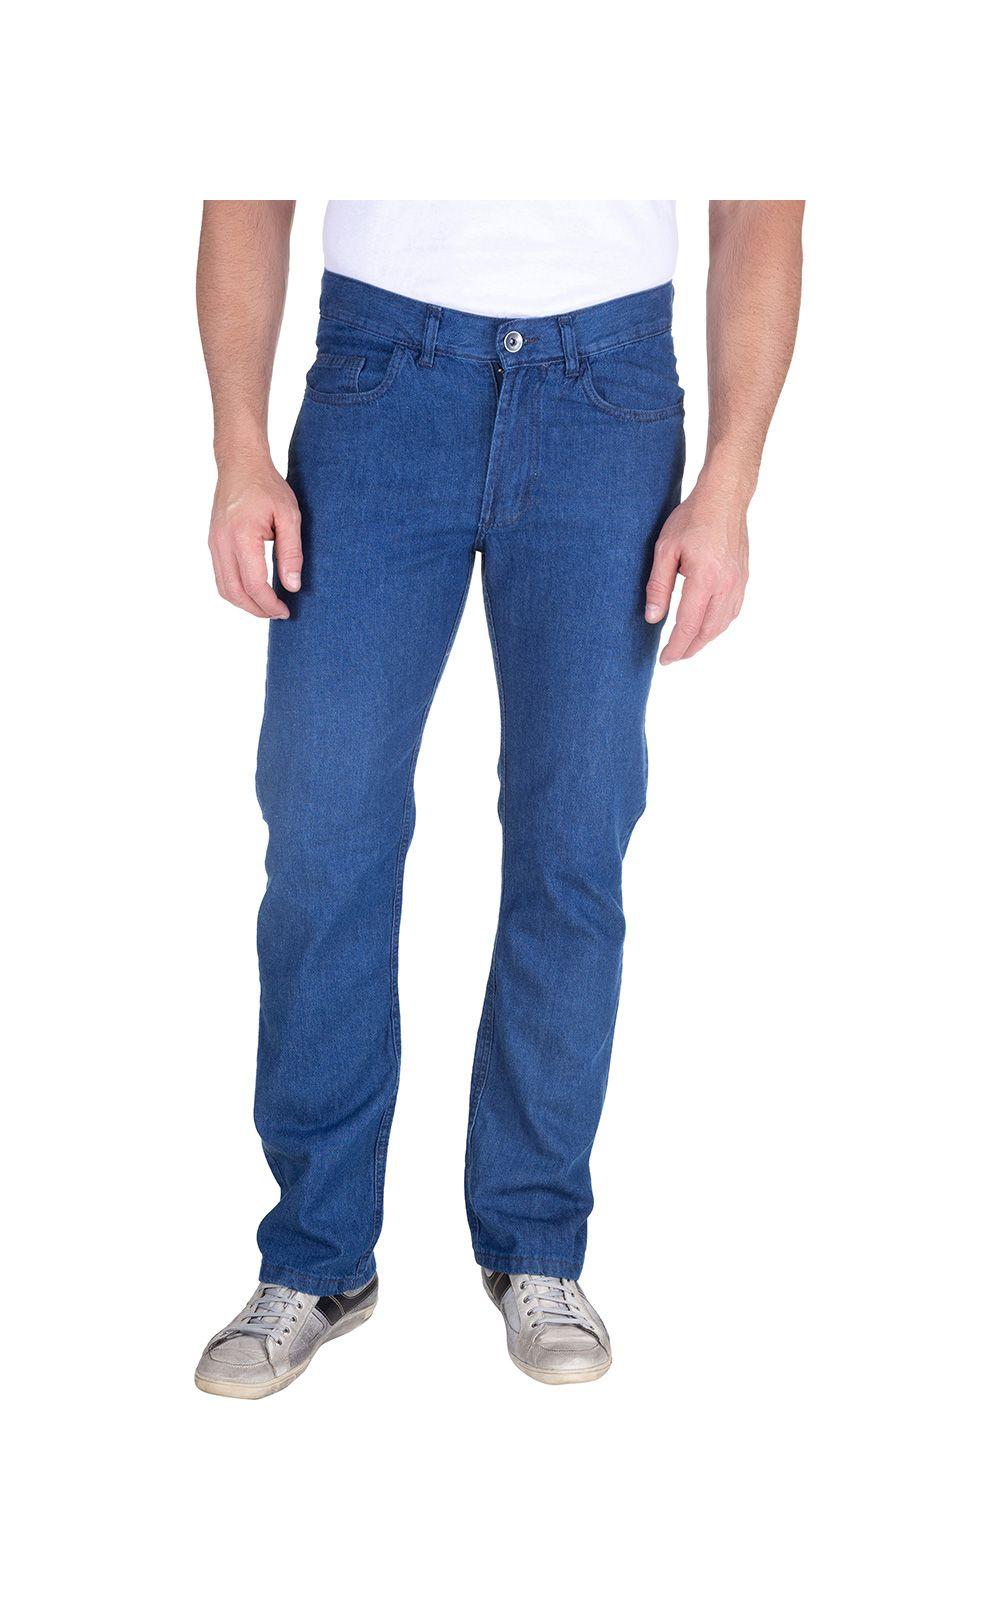 Foto 1 - Calça Jeans Masculina Azul Claro Lisa